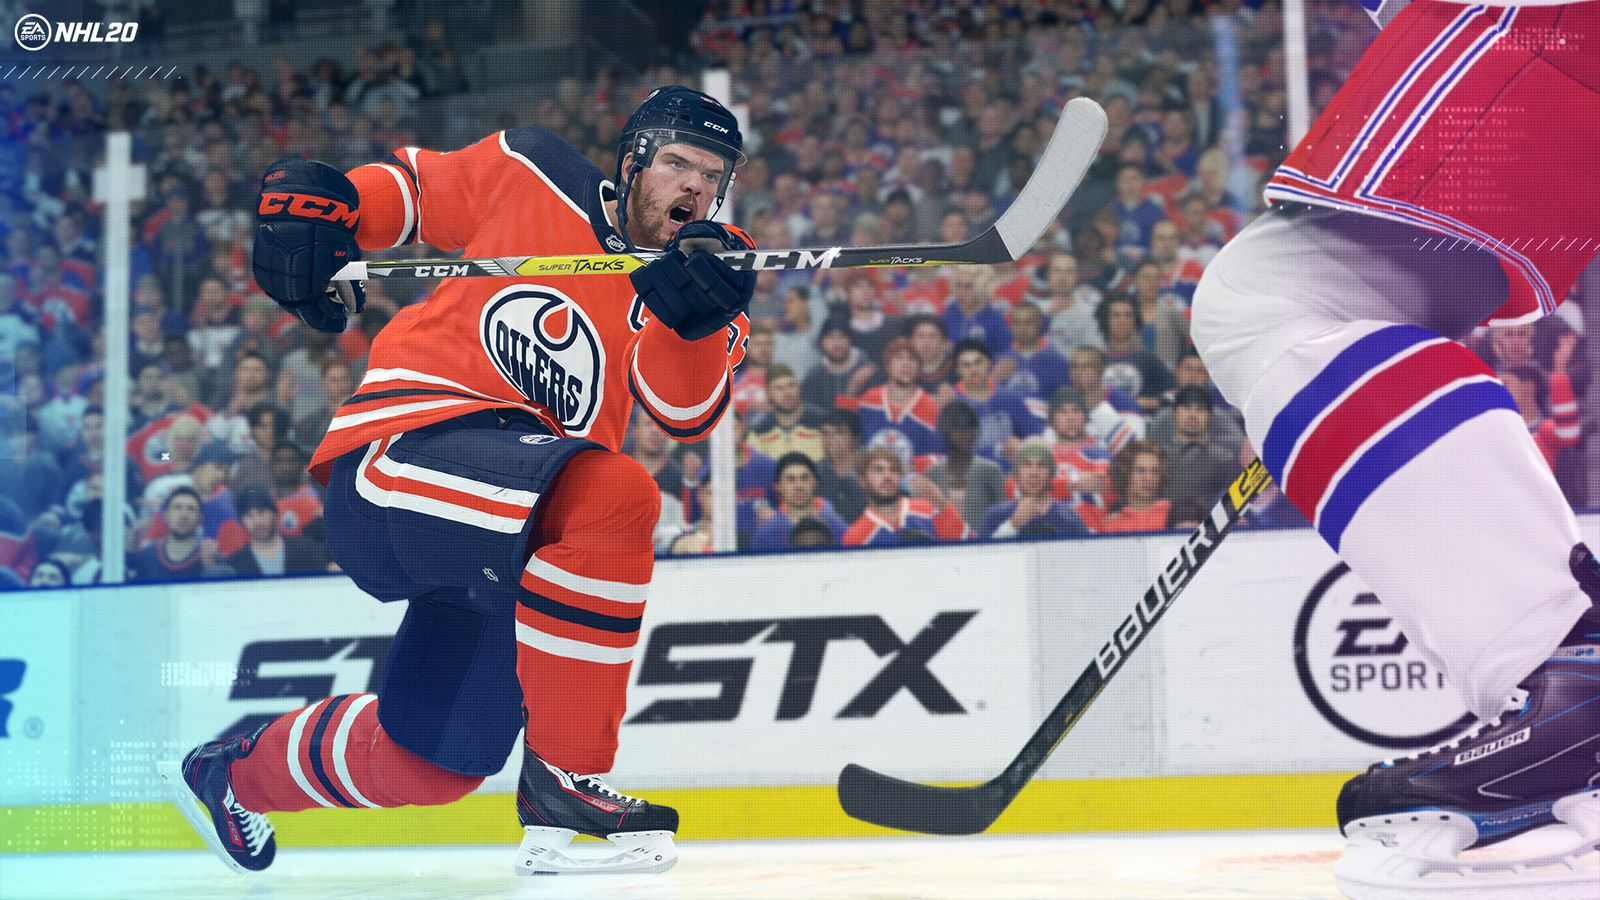 NHL20_EA Sports